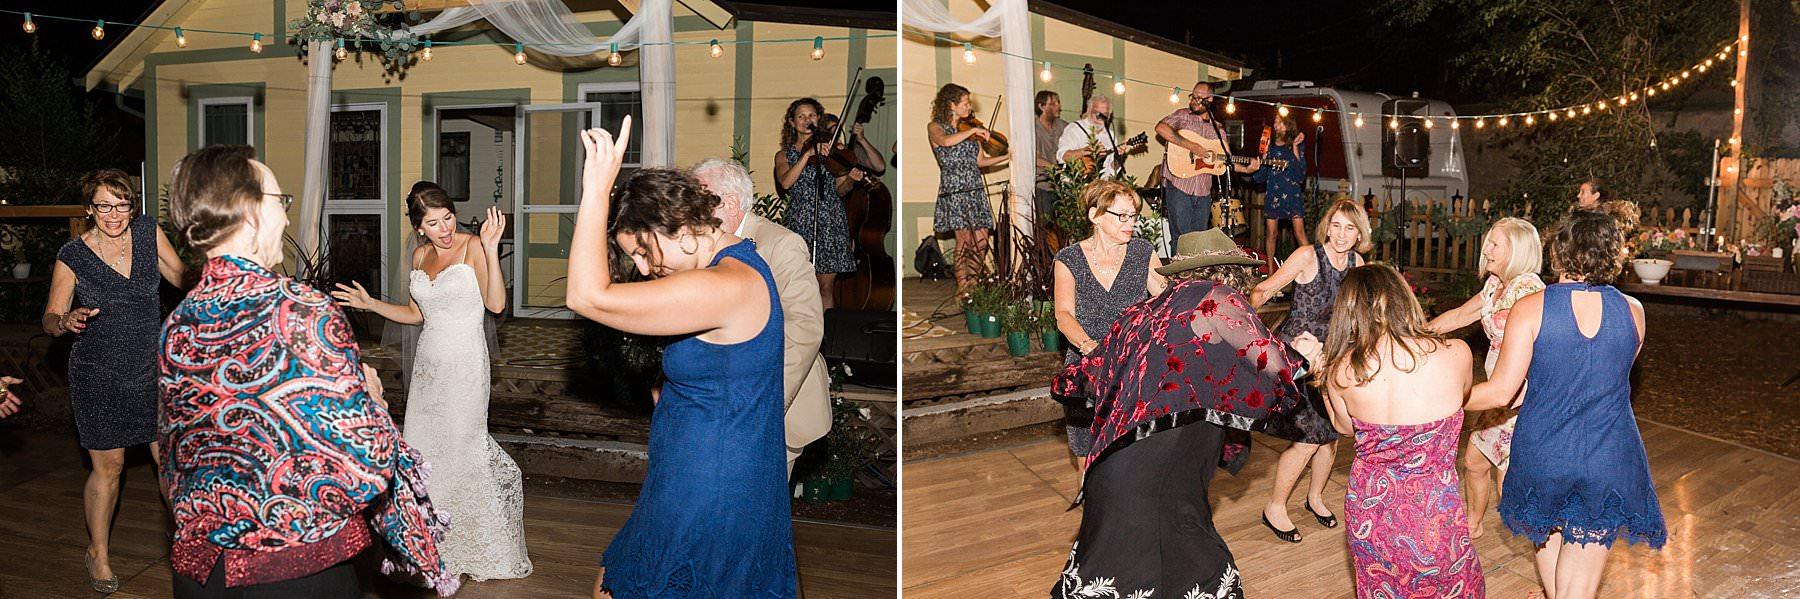 Backyard Wedding,DIY Wedding,Flagstaff Wedding,